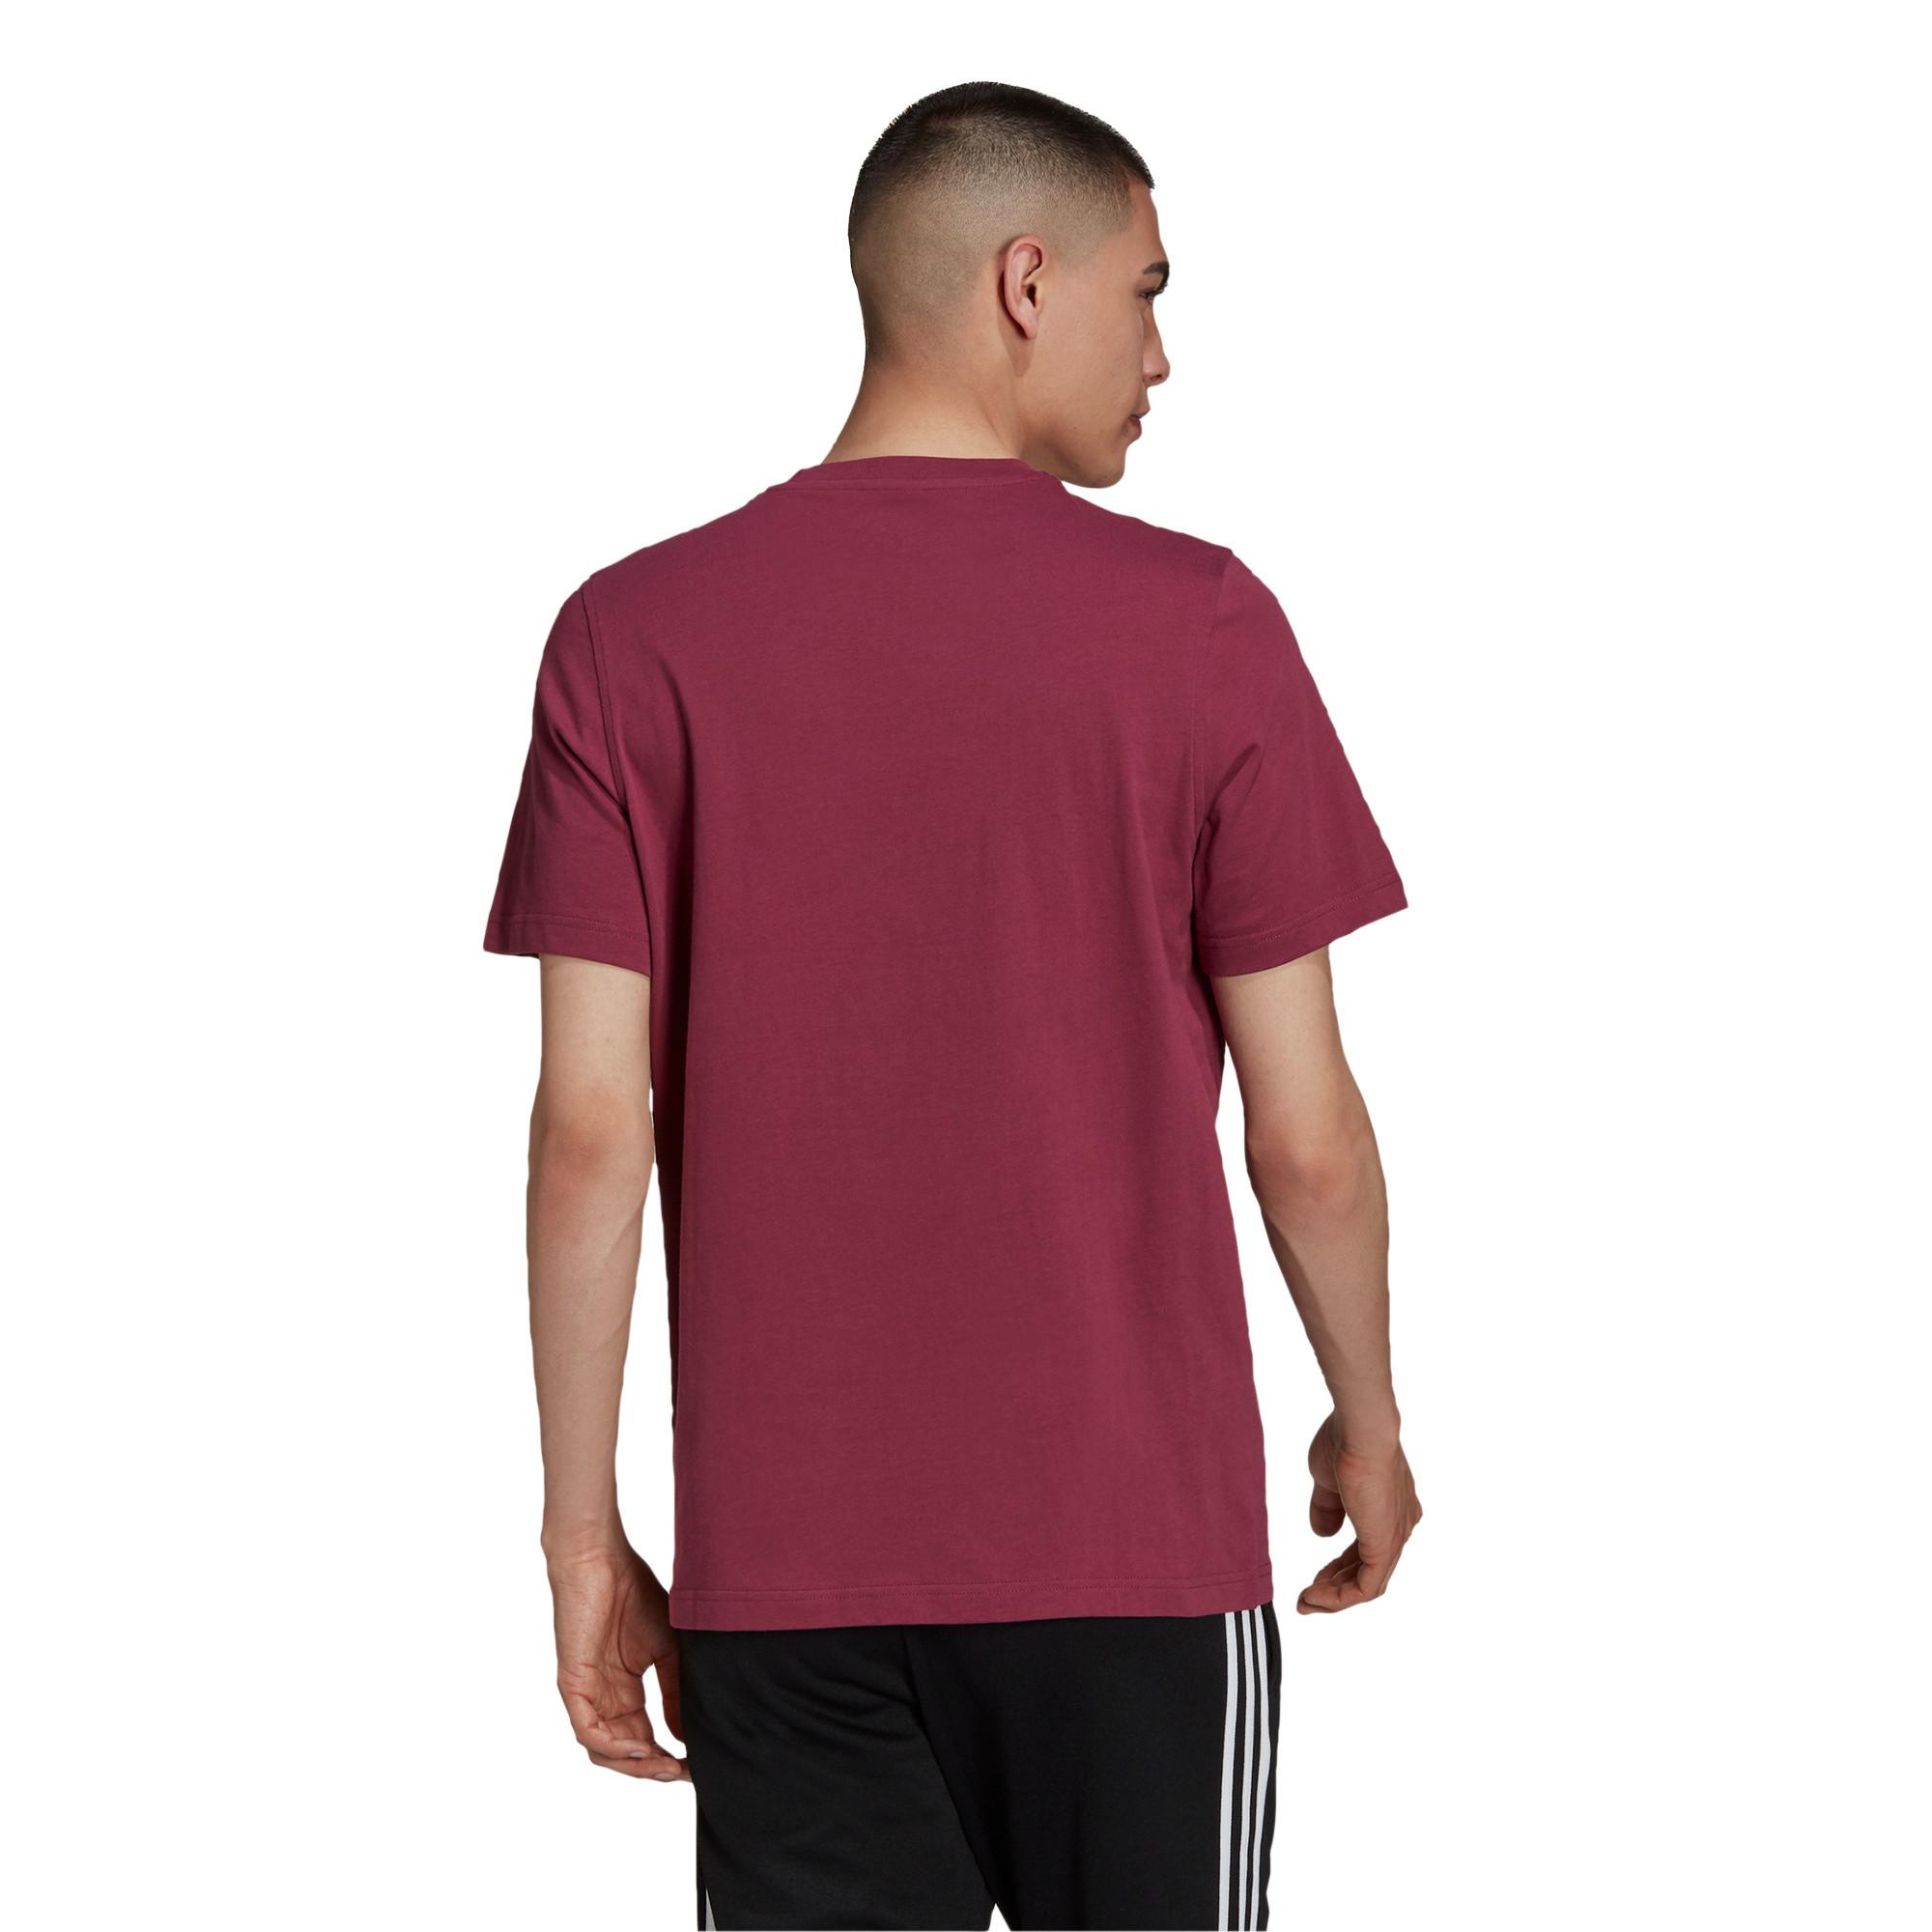 T-shirt uomo adicolor Classics Trefoil, Bianco/Rosso, large image number 1